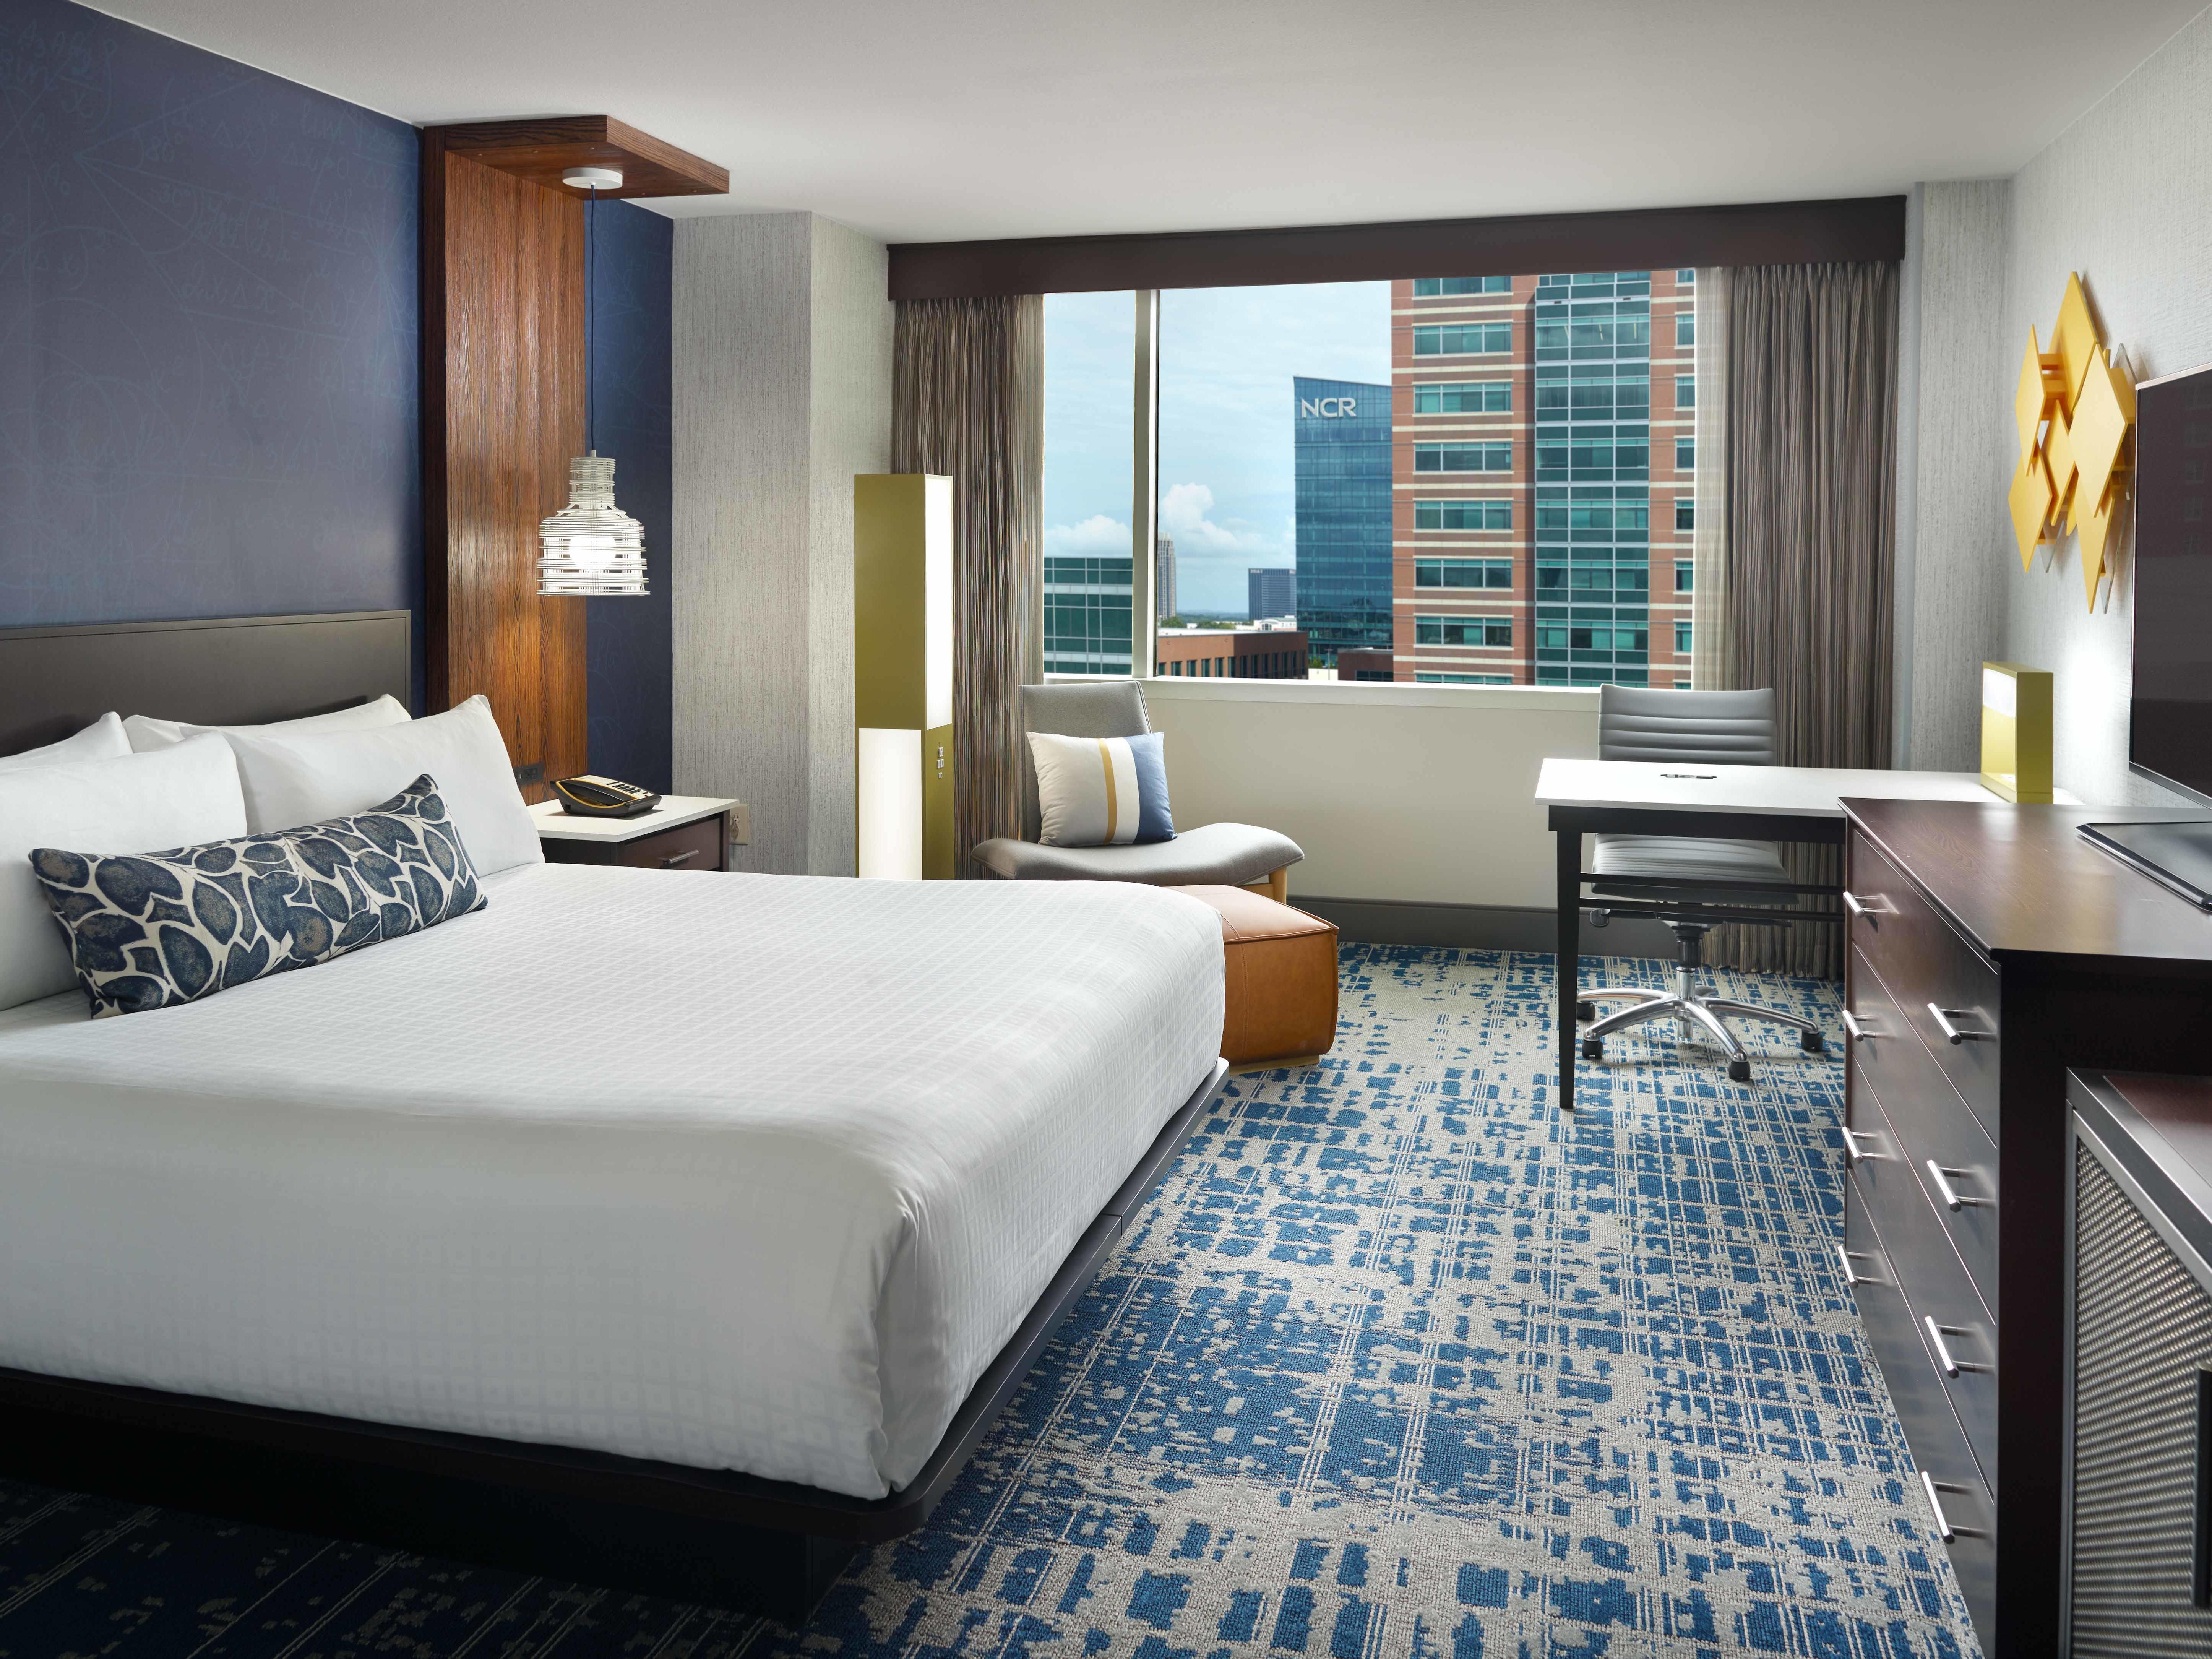 Georgia Tech Hotel King Guest Room